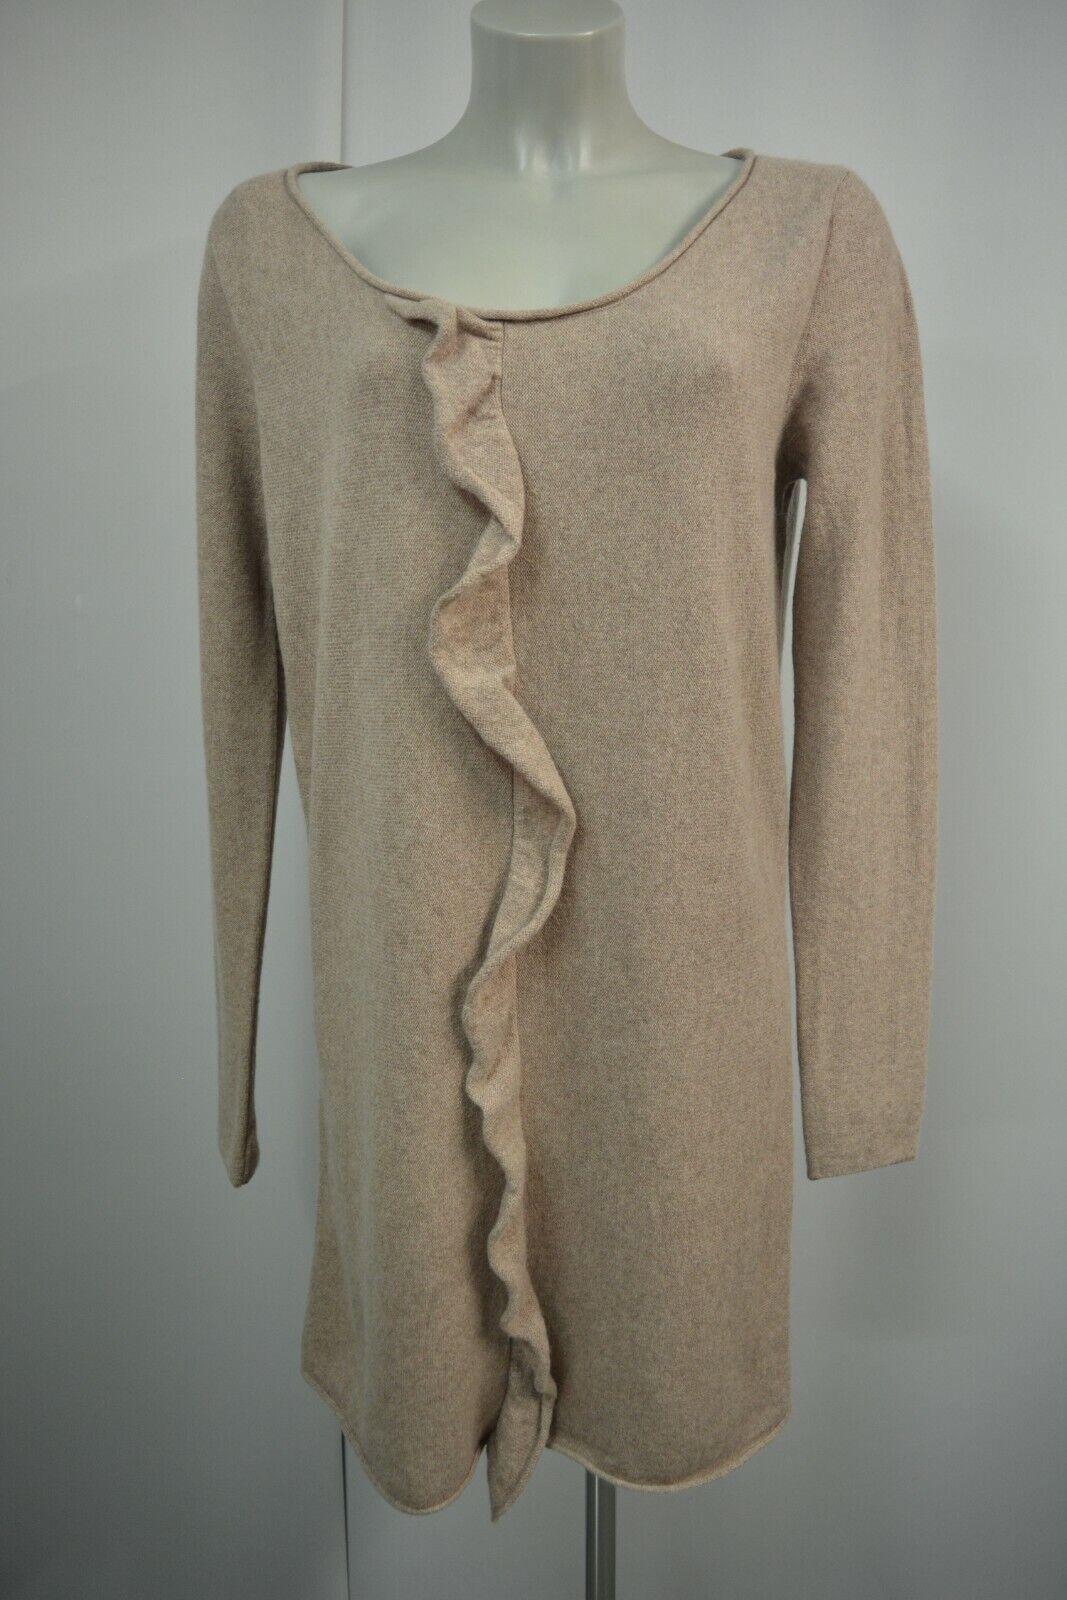 DEAR CASHMERE Strickkleid Kleid L  40  42 Beige Langarm 100% Kaschmir TOP 960